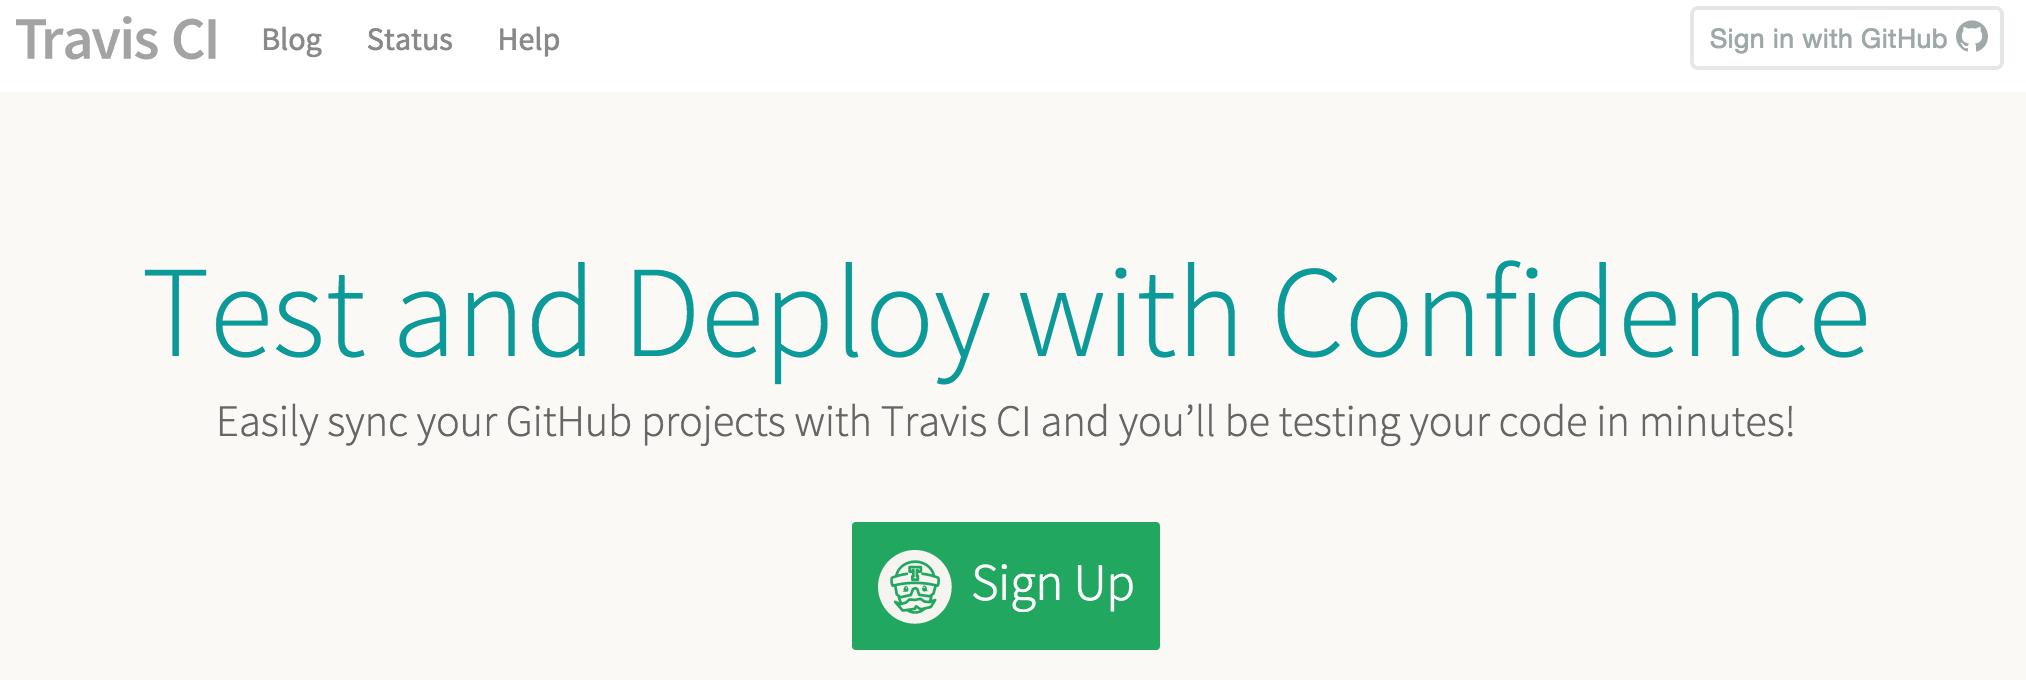 Travis CI sign up